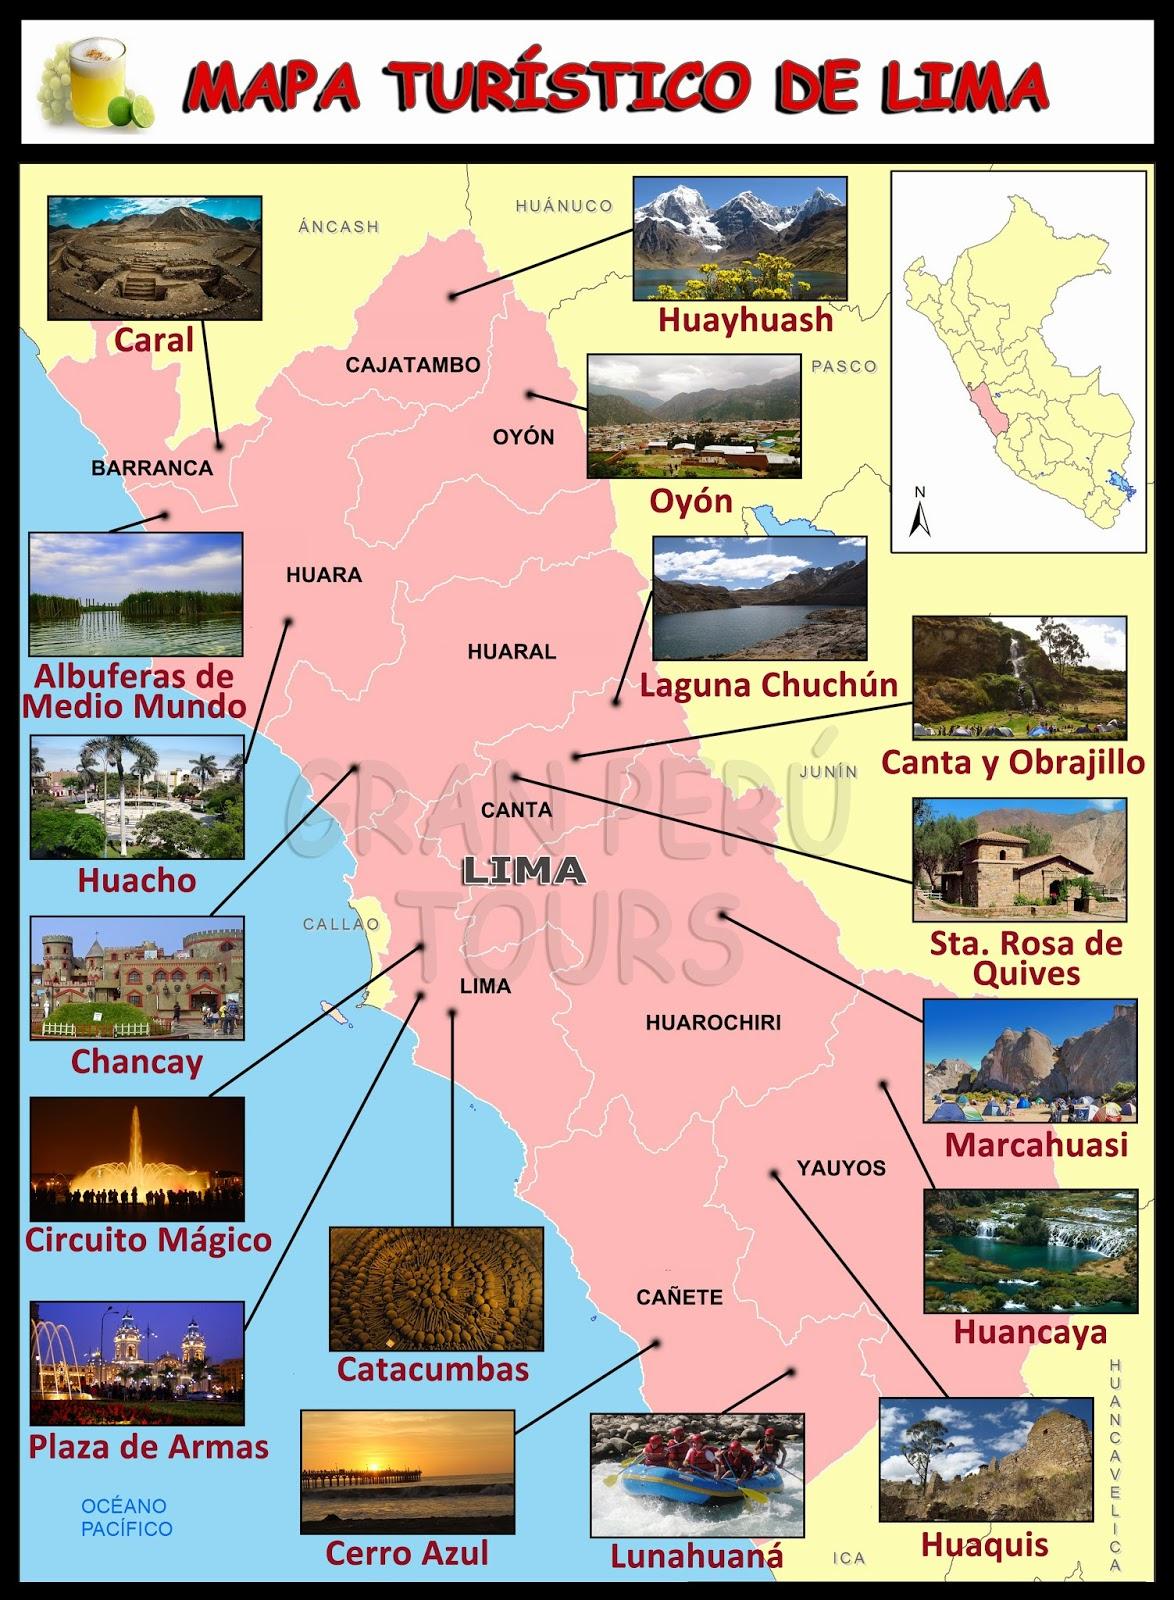 Mapa Turistico de Lima  Mapa Turistico de Lima